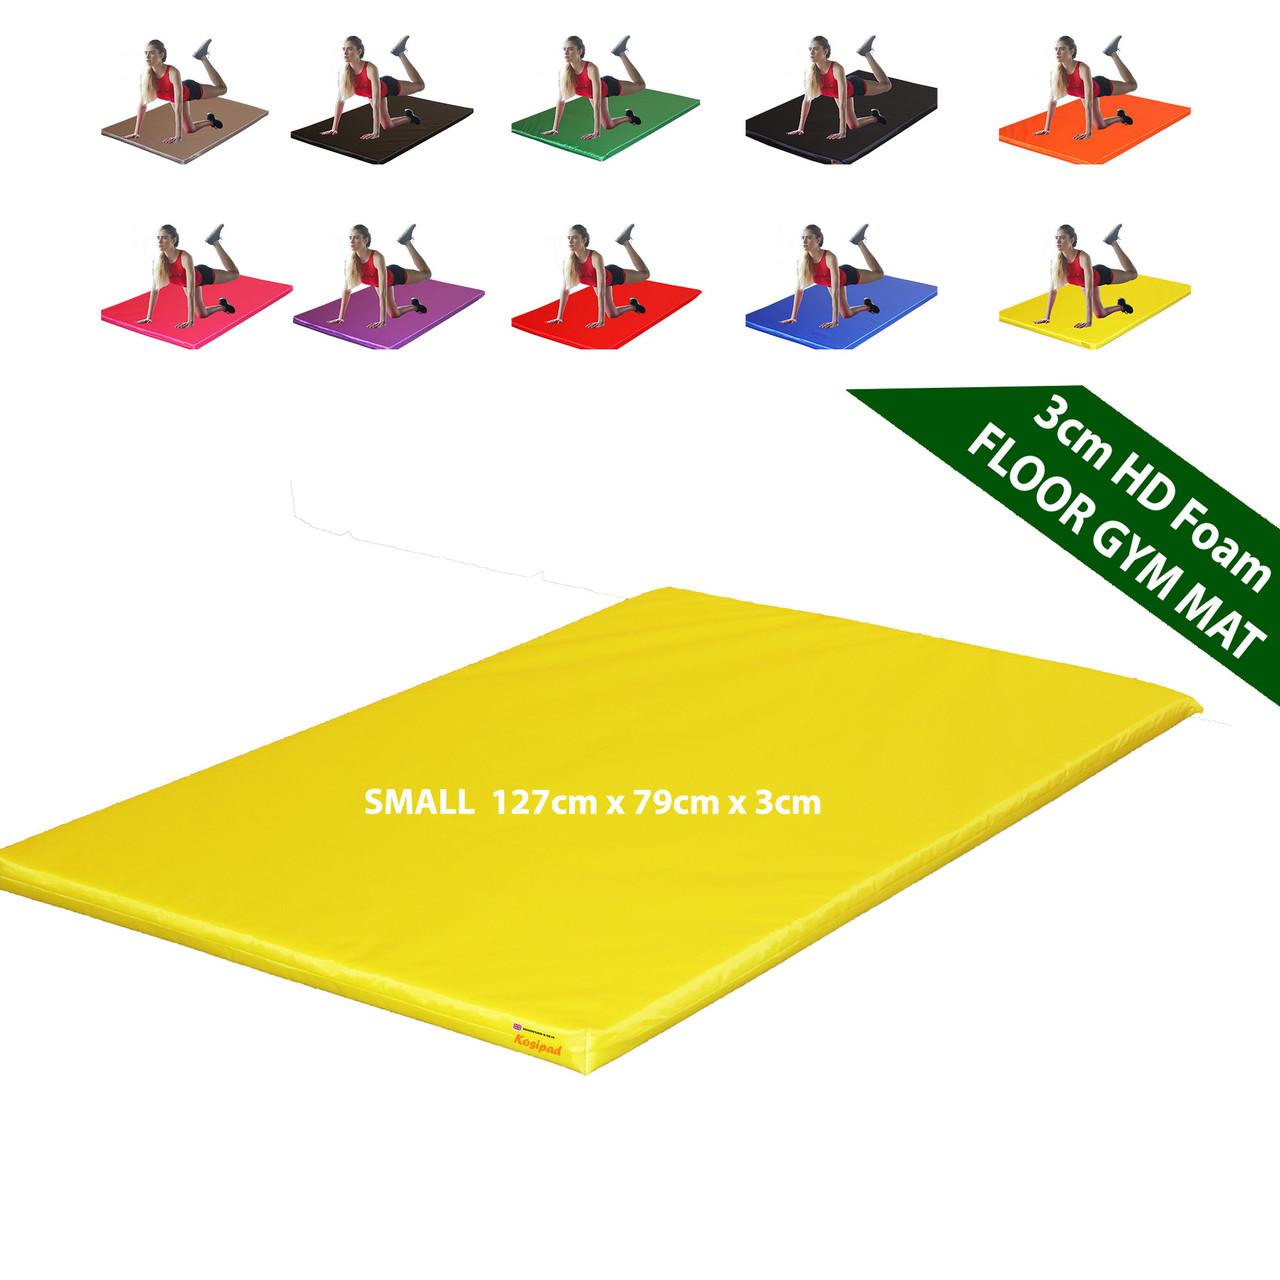 Kosipad 3cm Thick foam floor gym crash mats Yellow Small 3